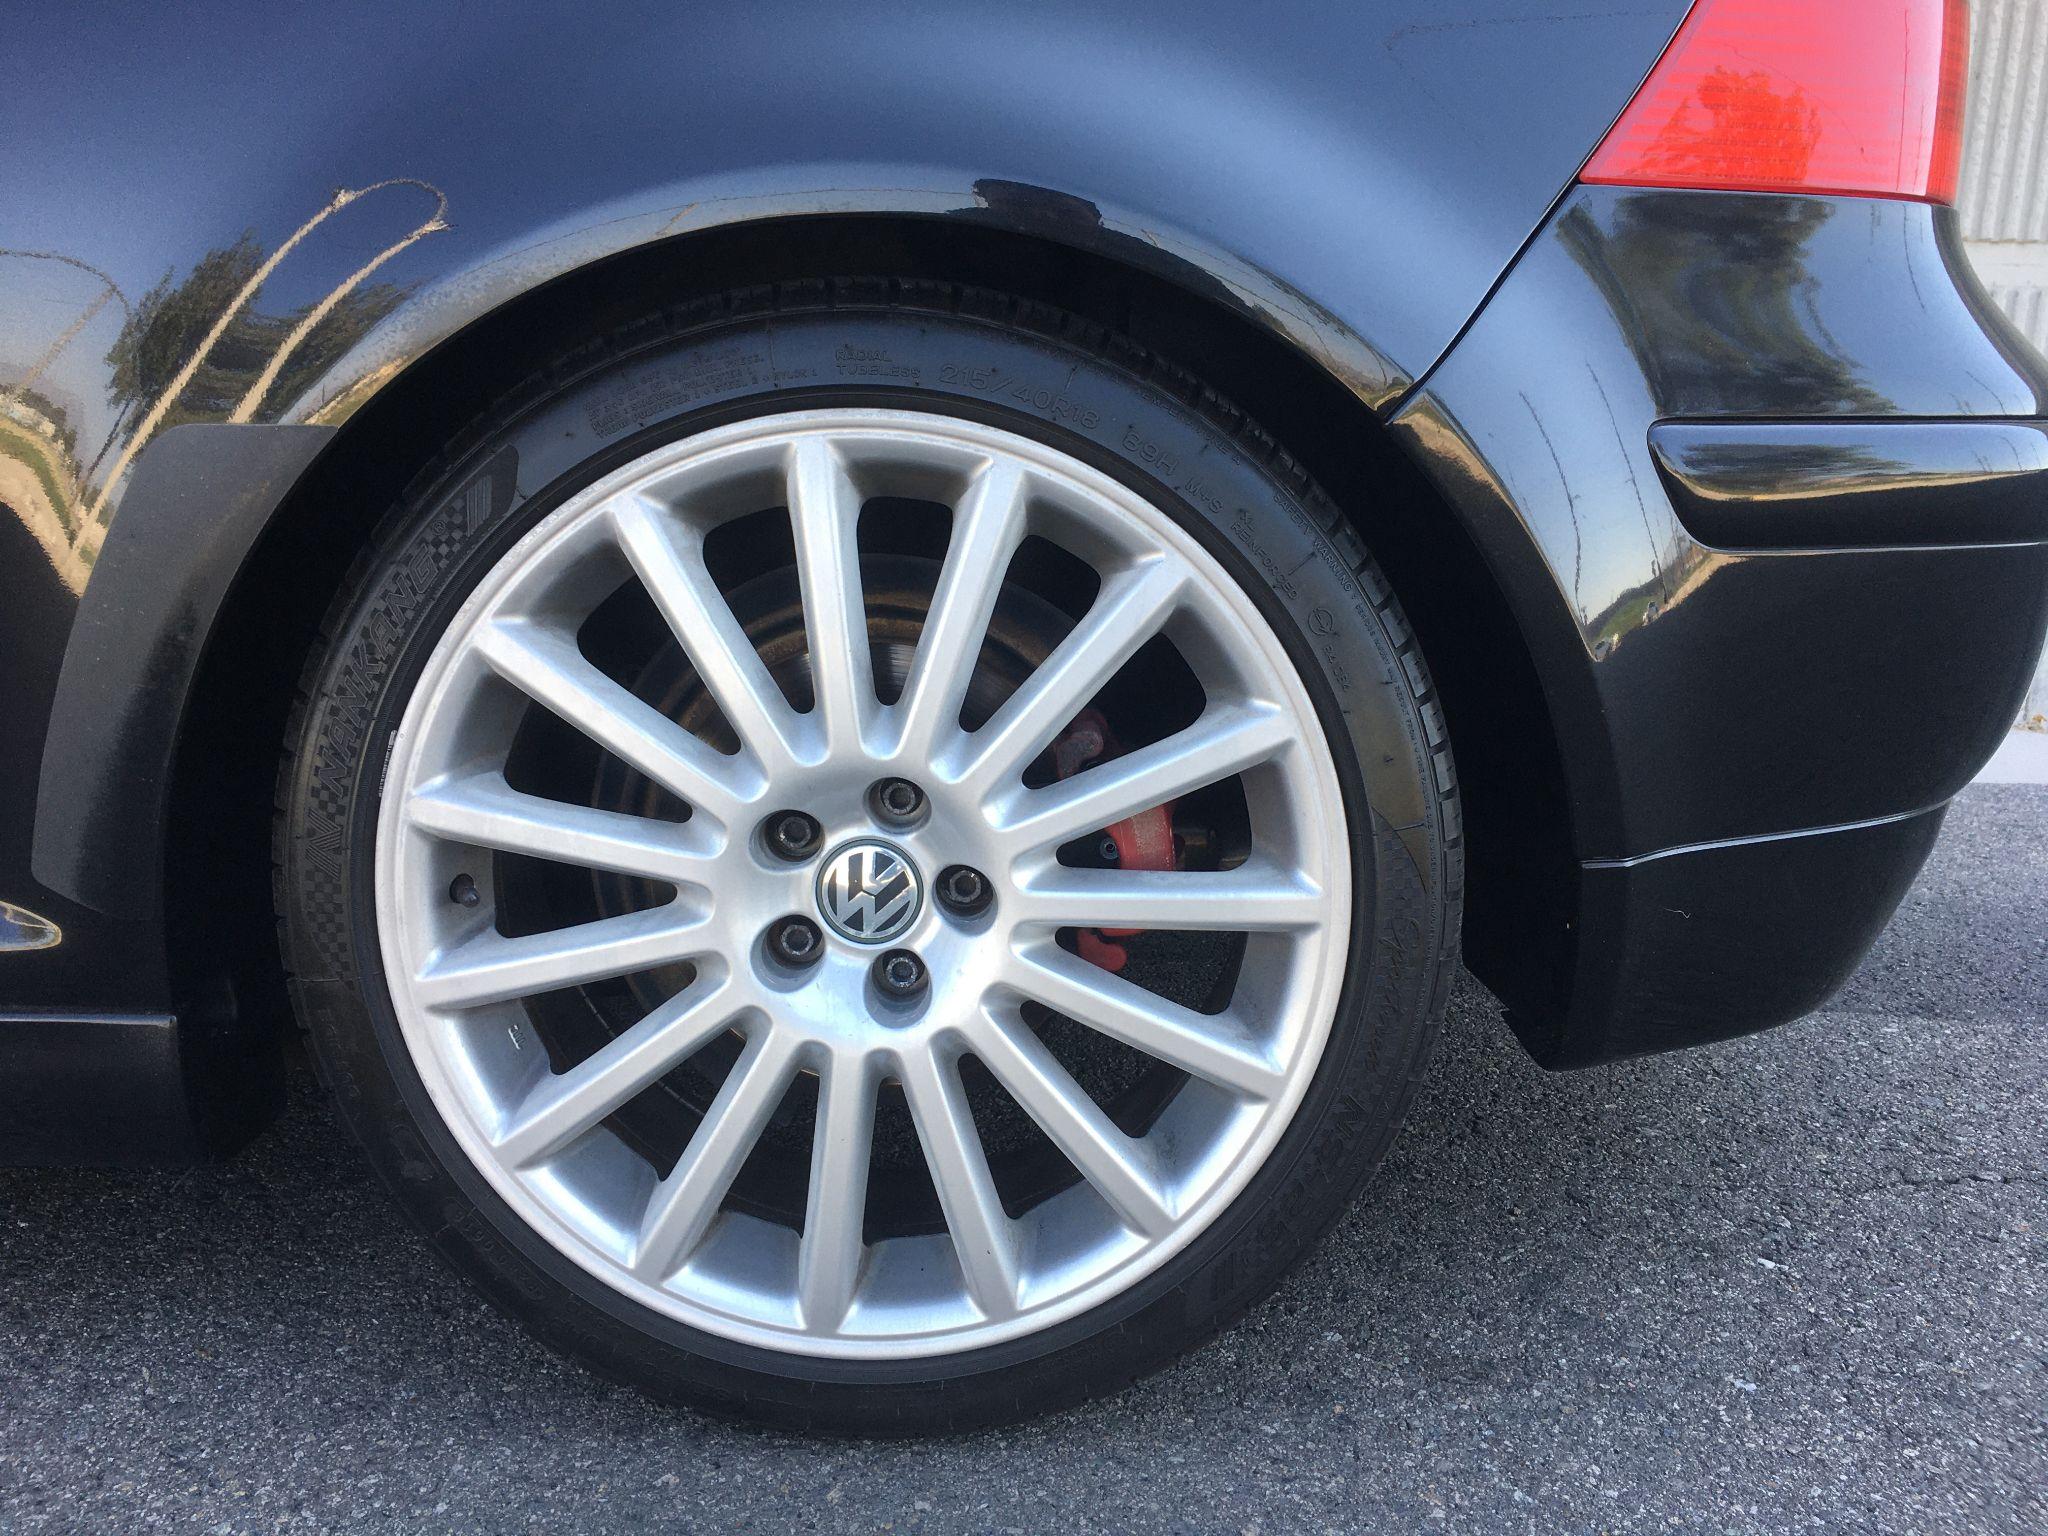 2003 Volkswagen GTI 20th Anniv Edition